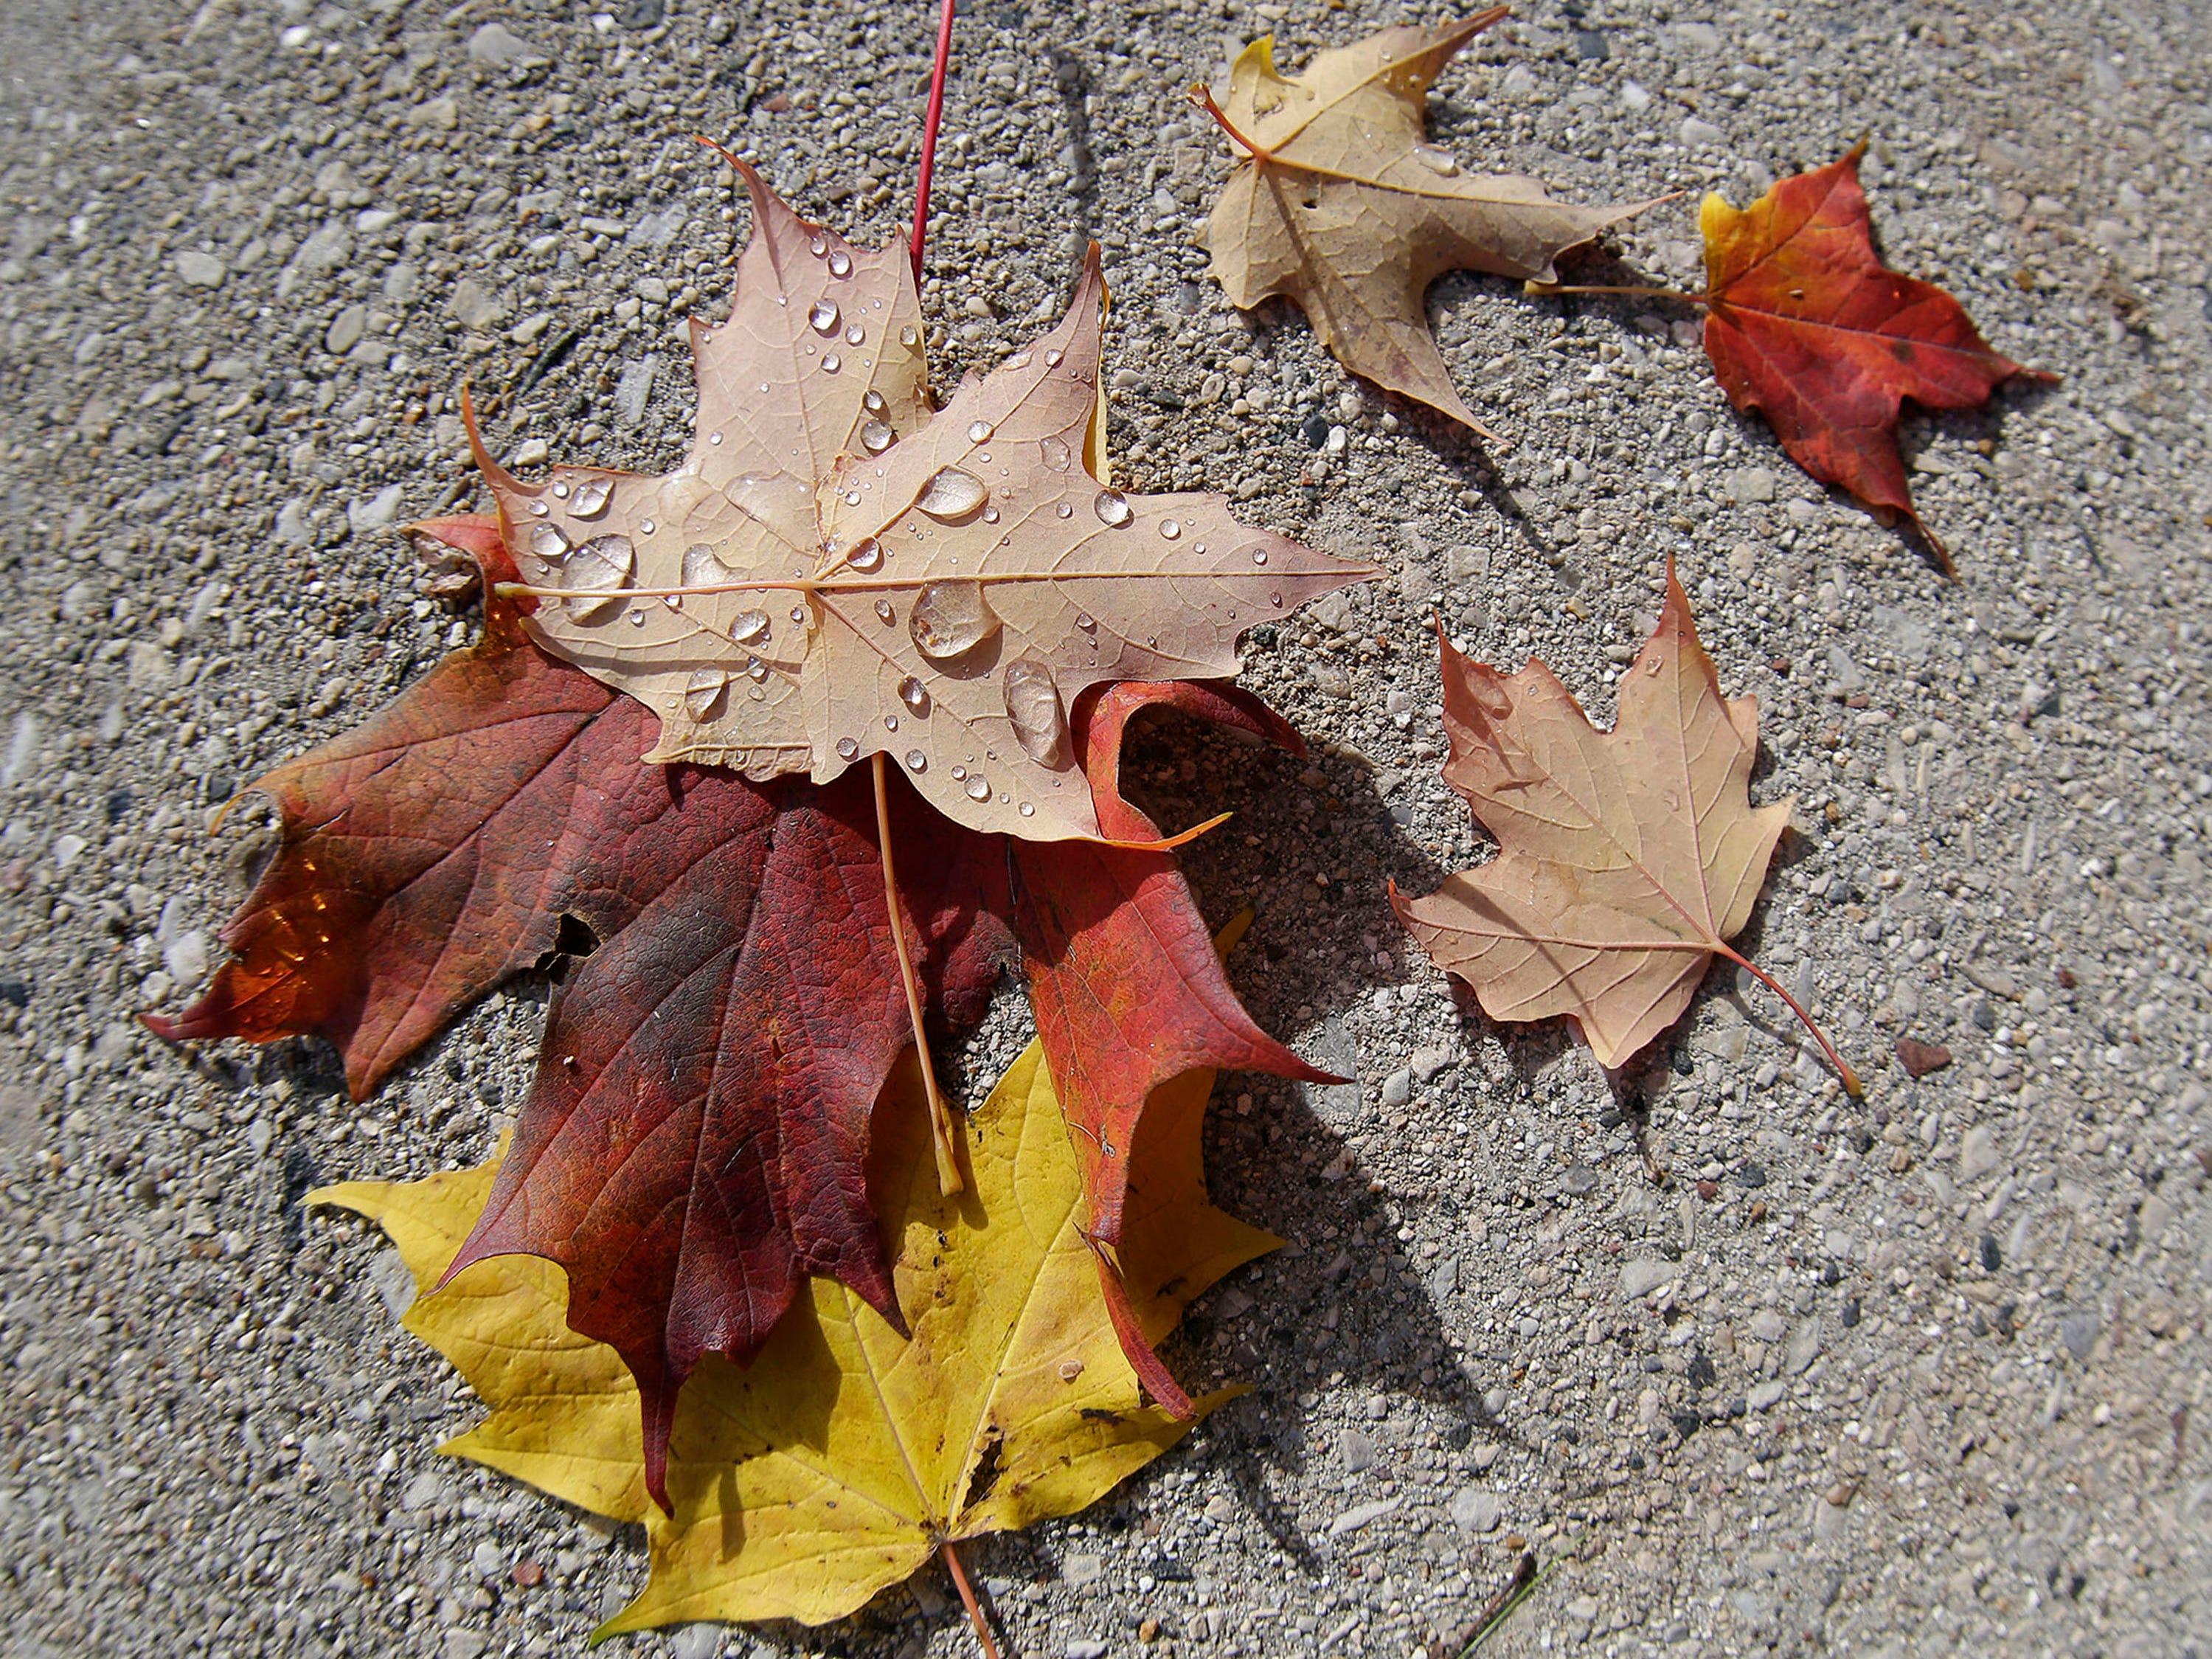 Fallen leaves on a sidewalk along Evans Avenue, Wednesday, October 31, 2018, in Sheboygan, Wis.